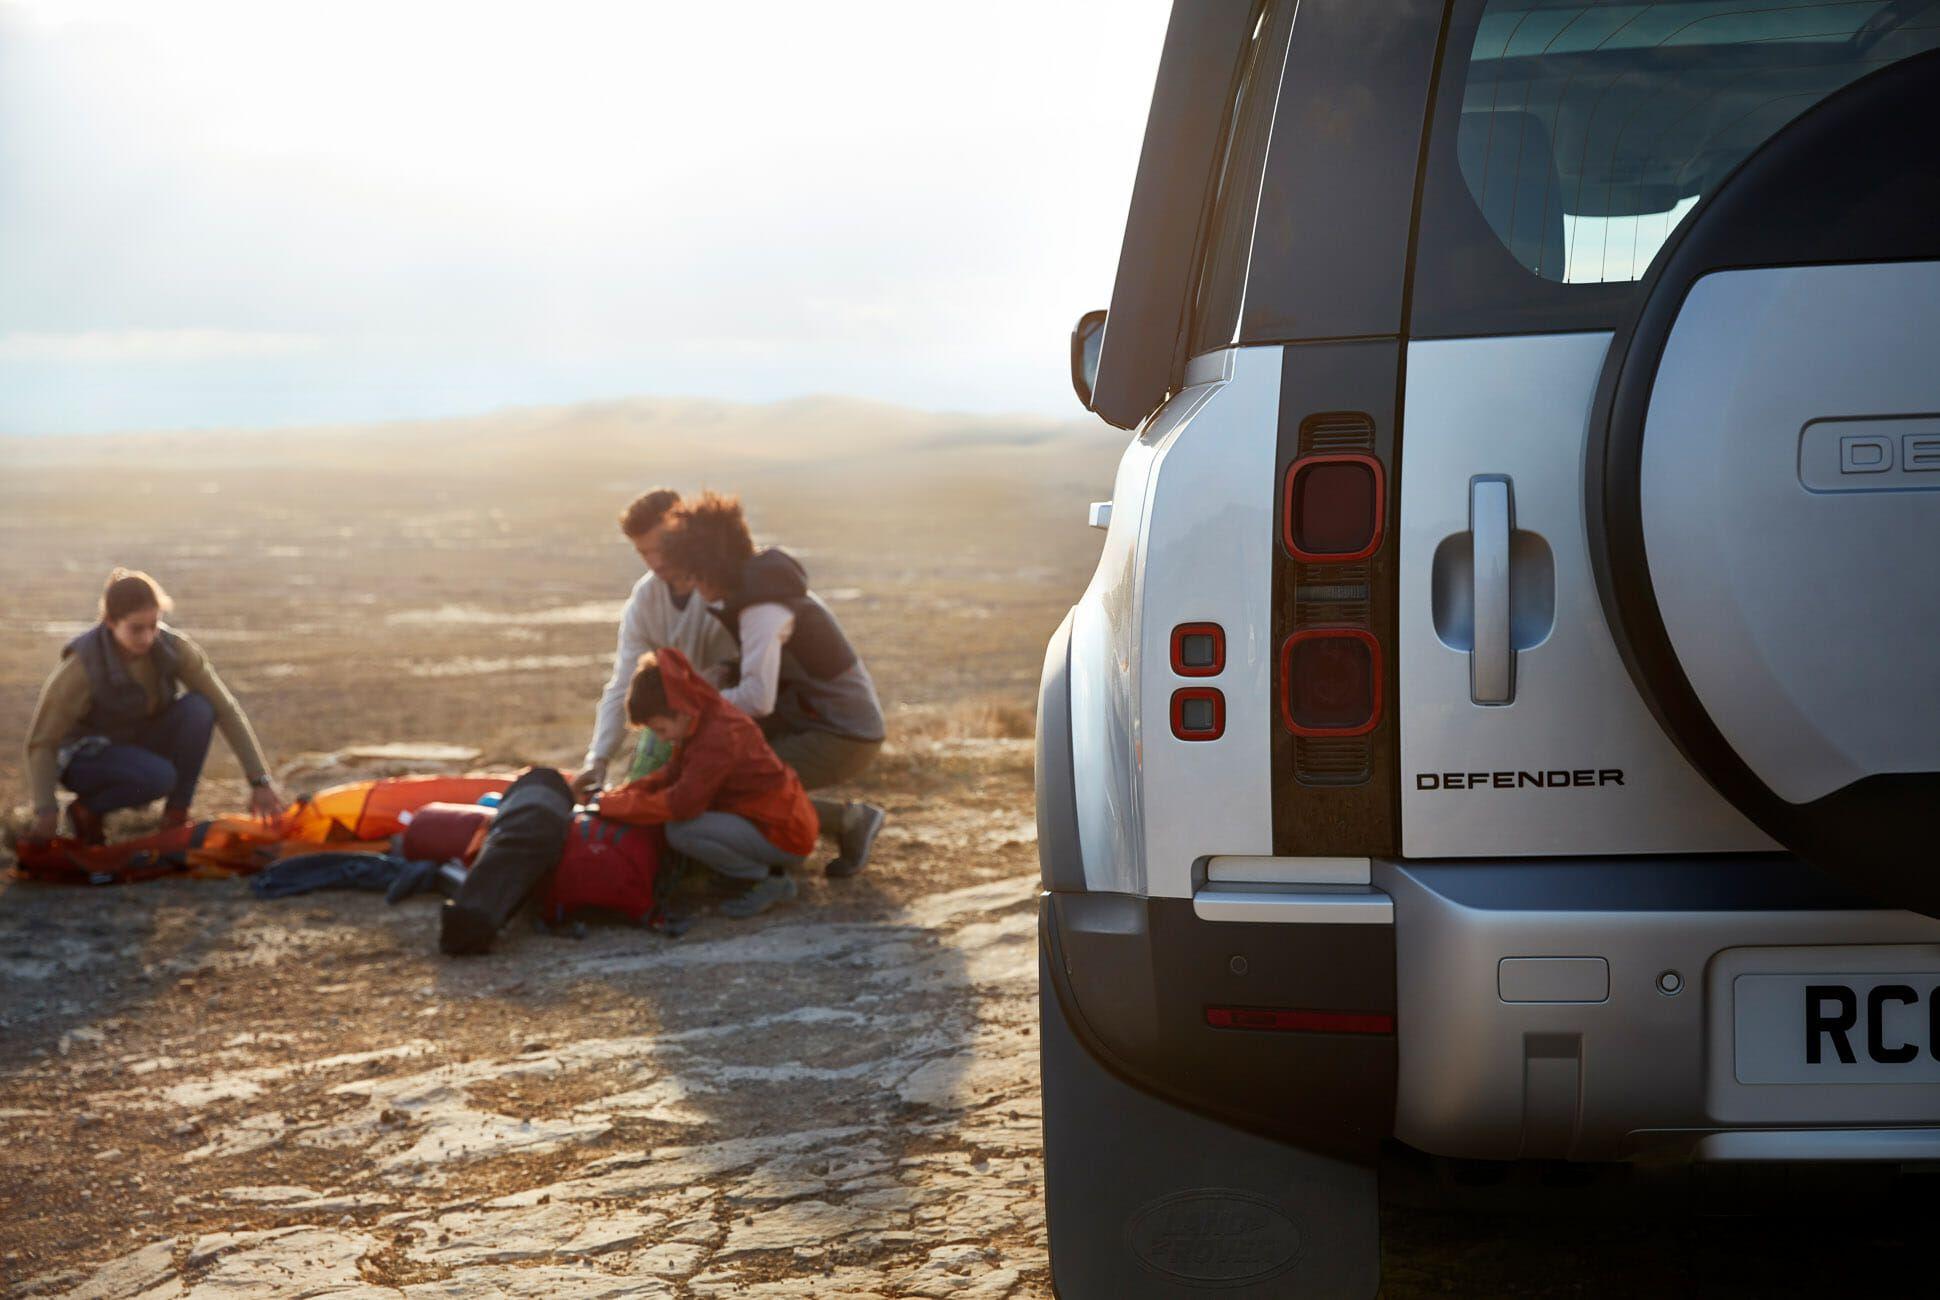 Land Rover Defender Gear Patrol-Exterior Action-Slide-18